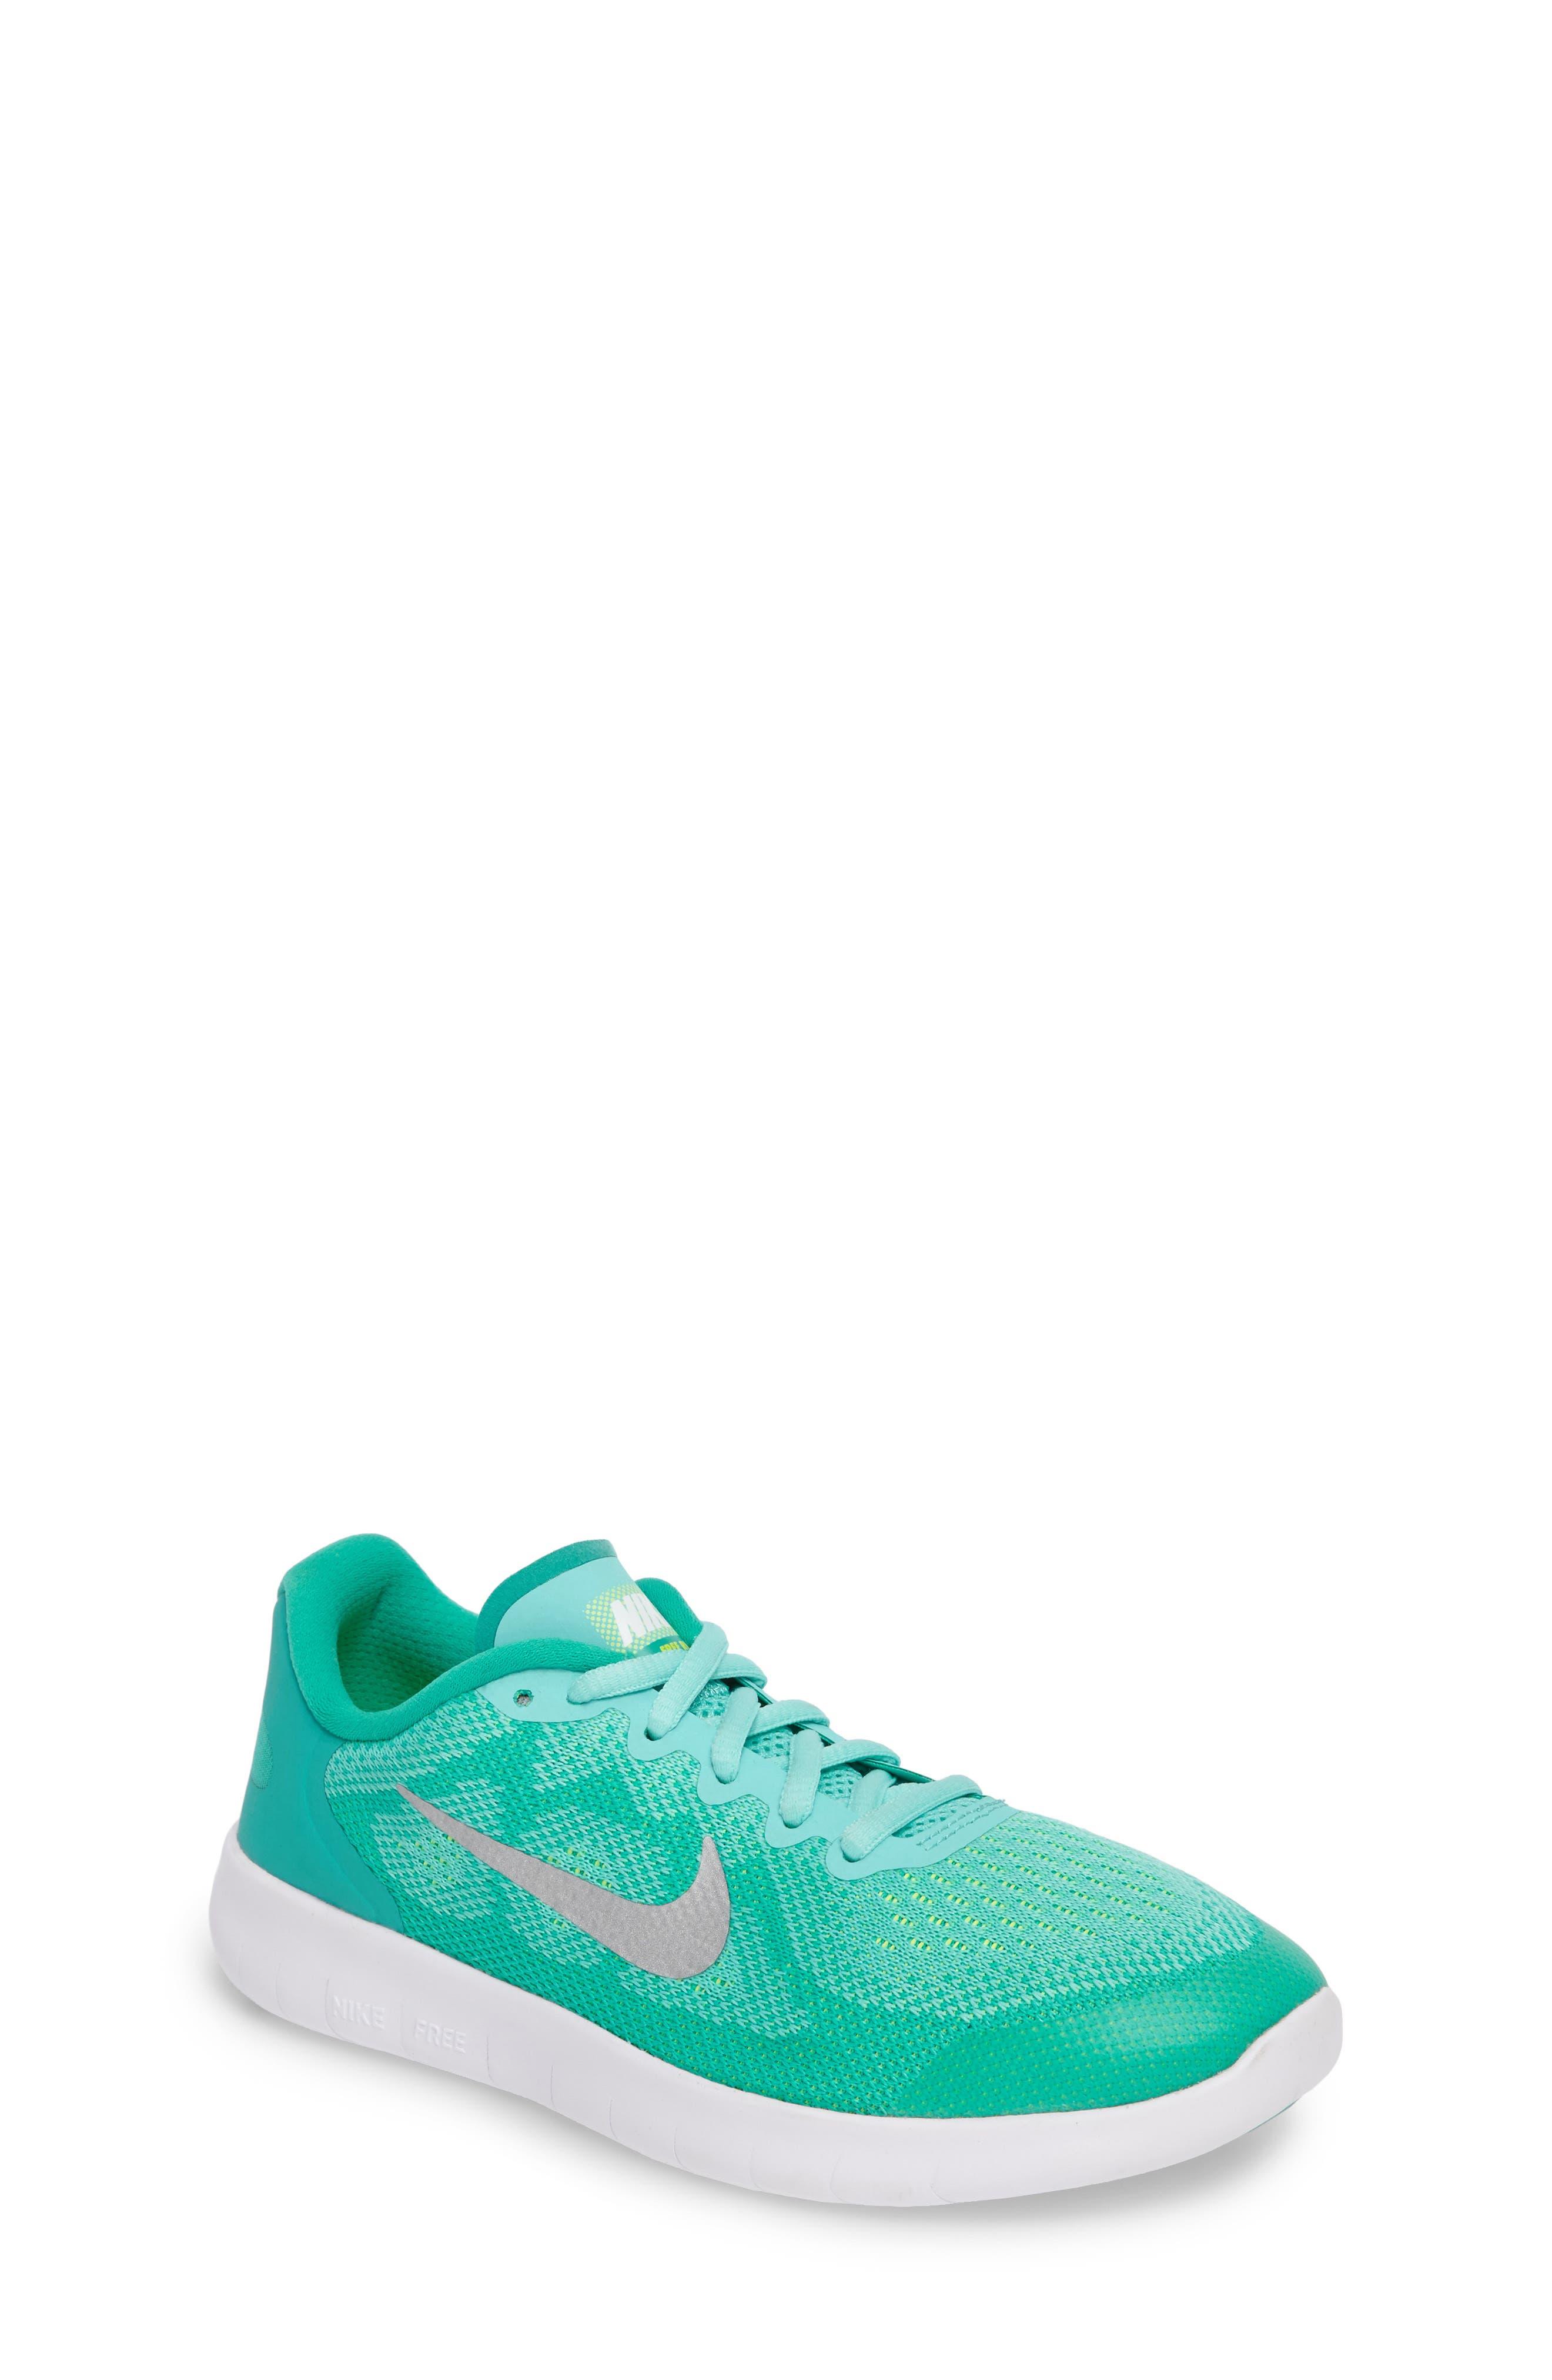 Main Image - Nike Free Run 2 Athletic Shoe (Big Kid)